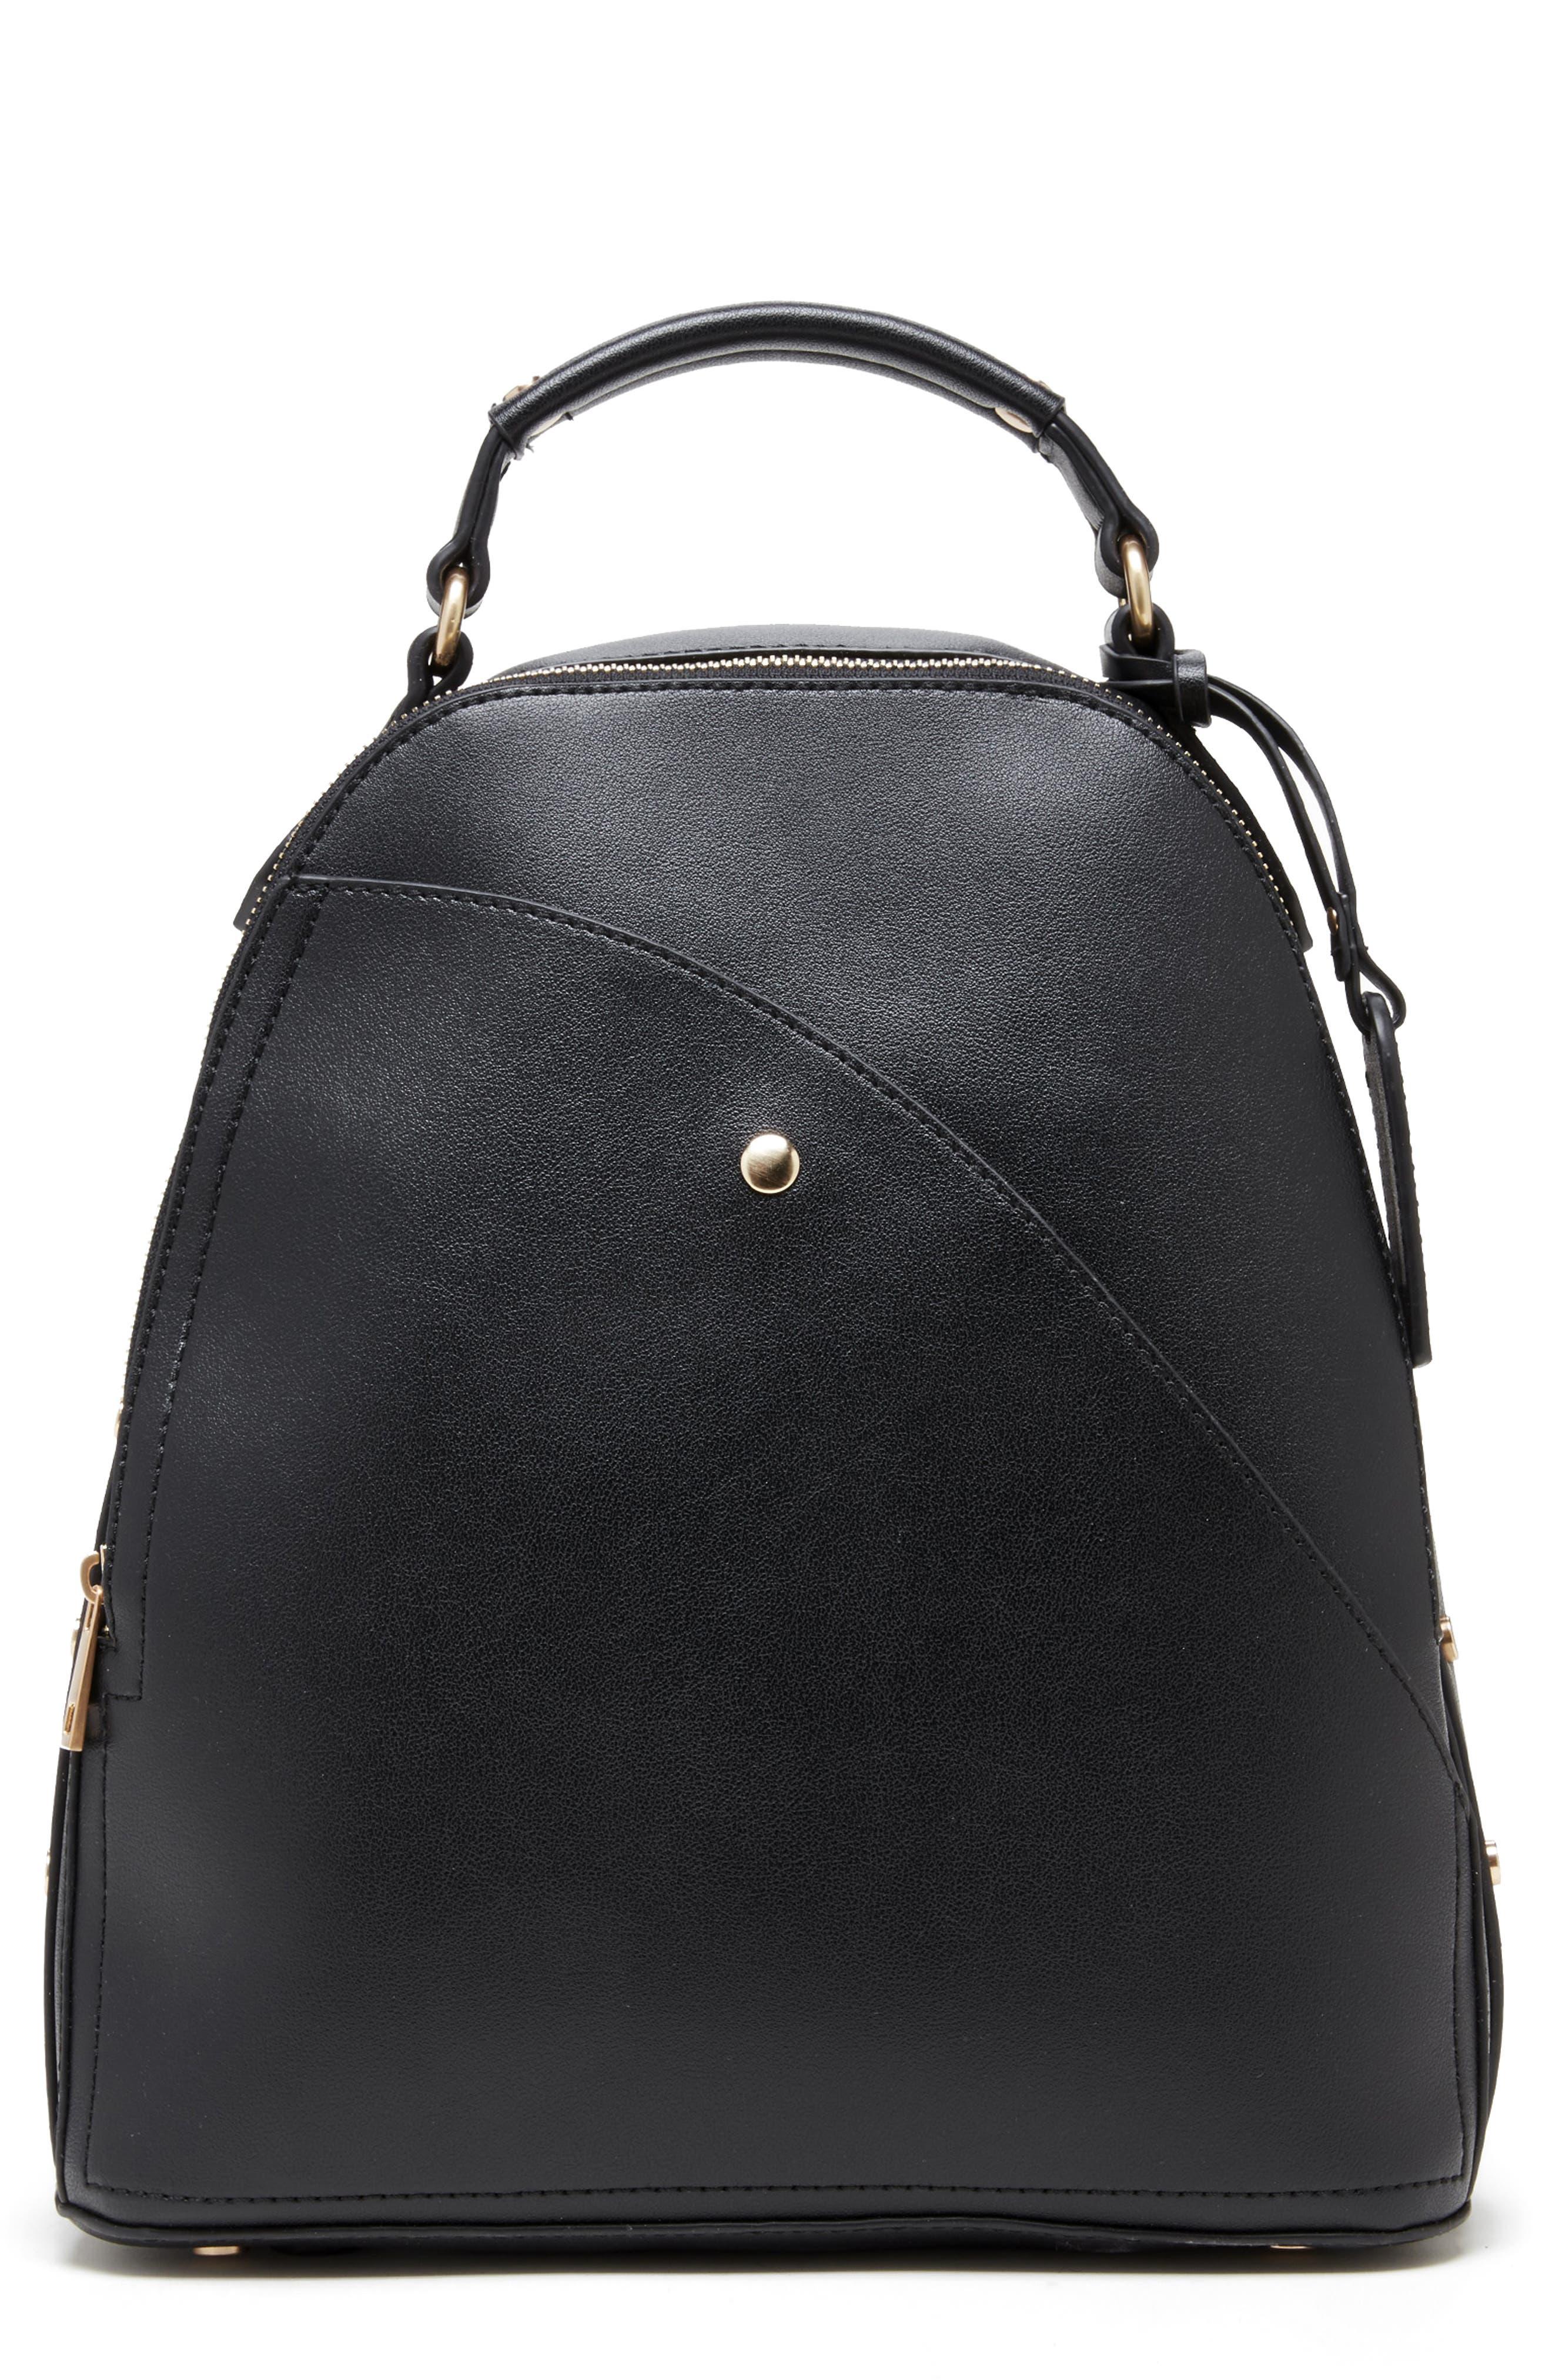 SOLE SOCIETY, Hingi Faux Leather Backpack, Main thumbnail 1, color, 001